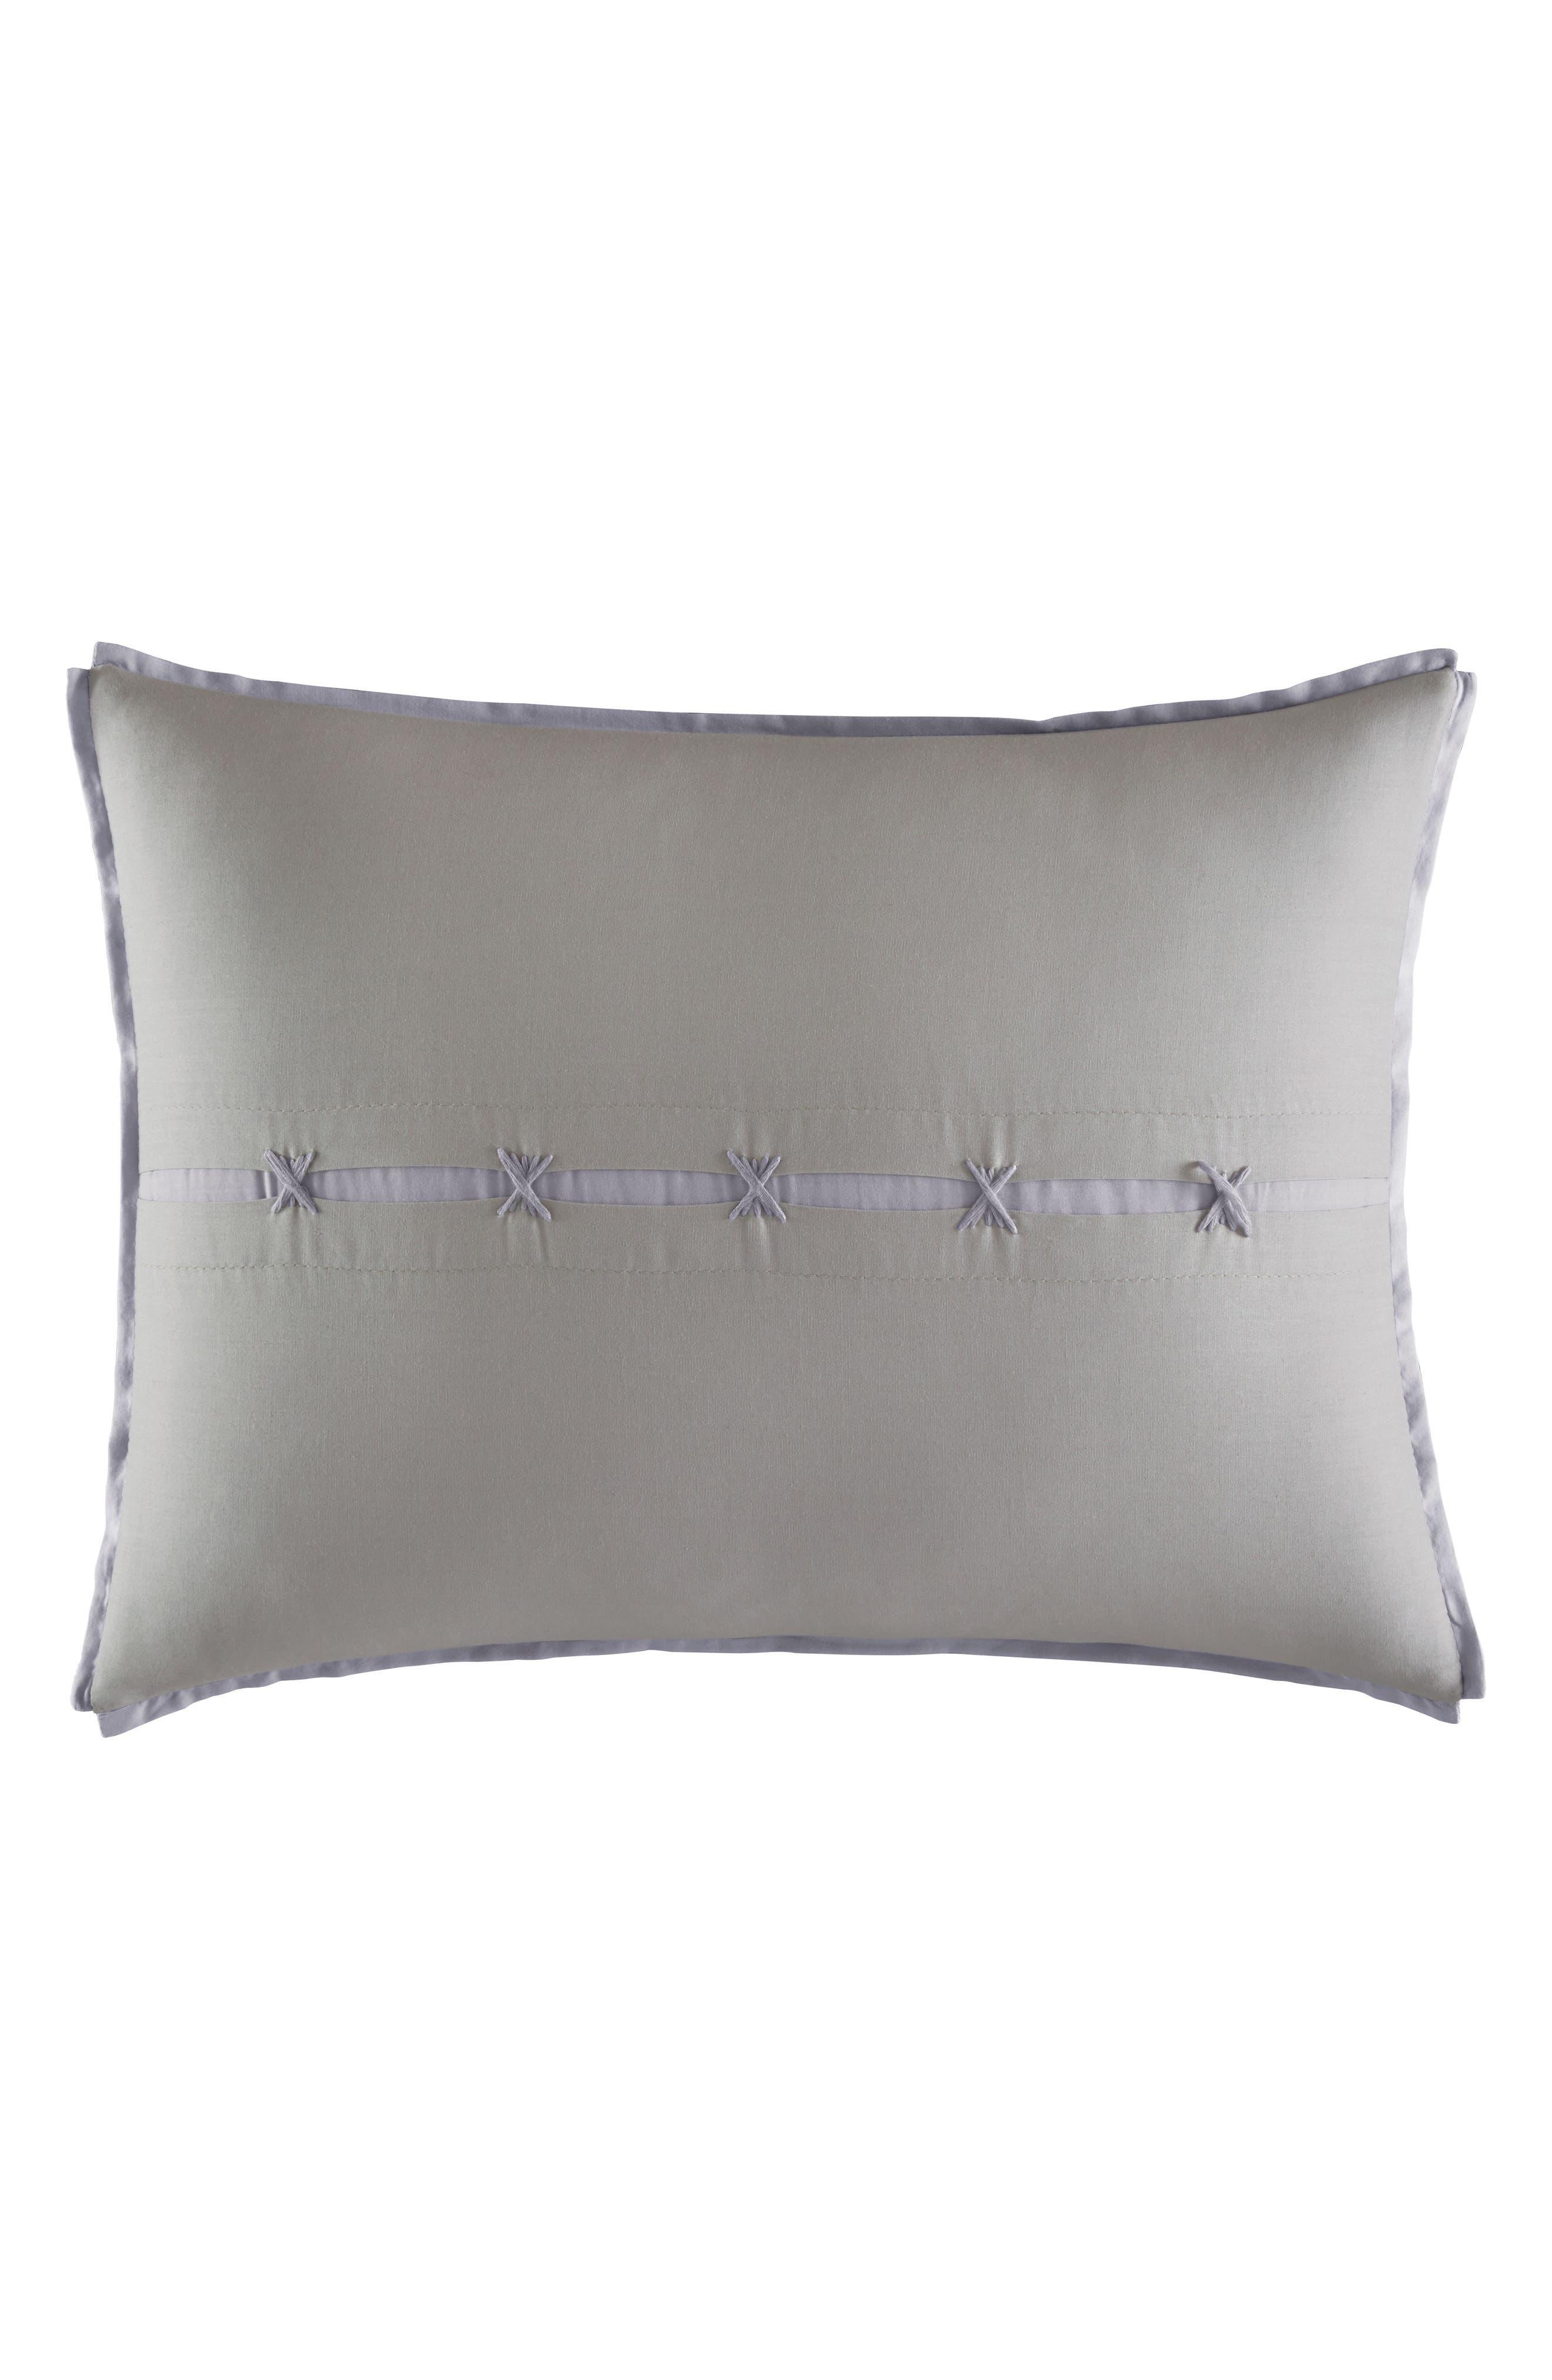 Transparent Leaves Accent Pillow,                         Main,                         color, Medium Gray